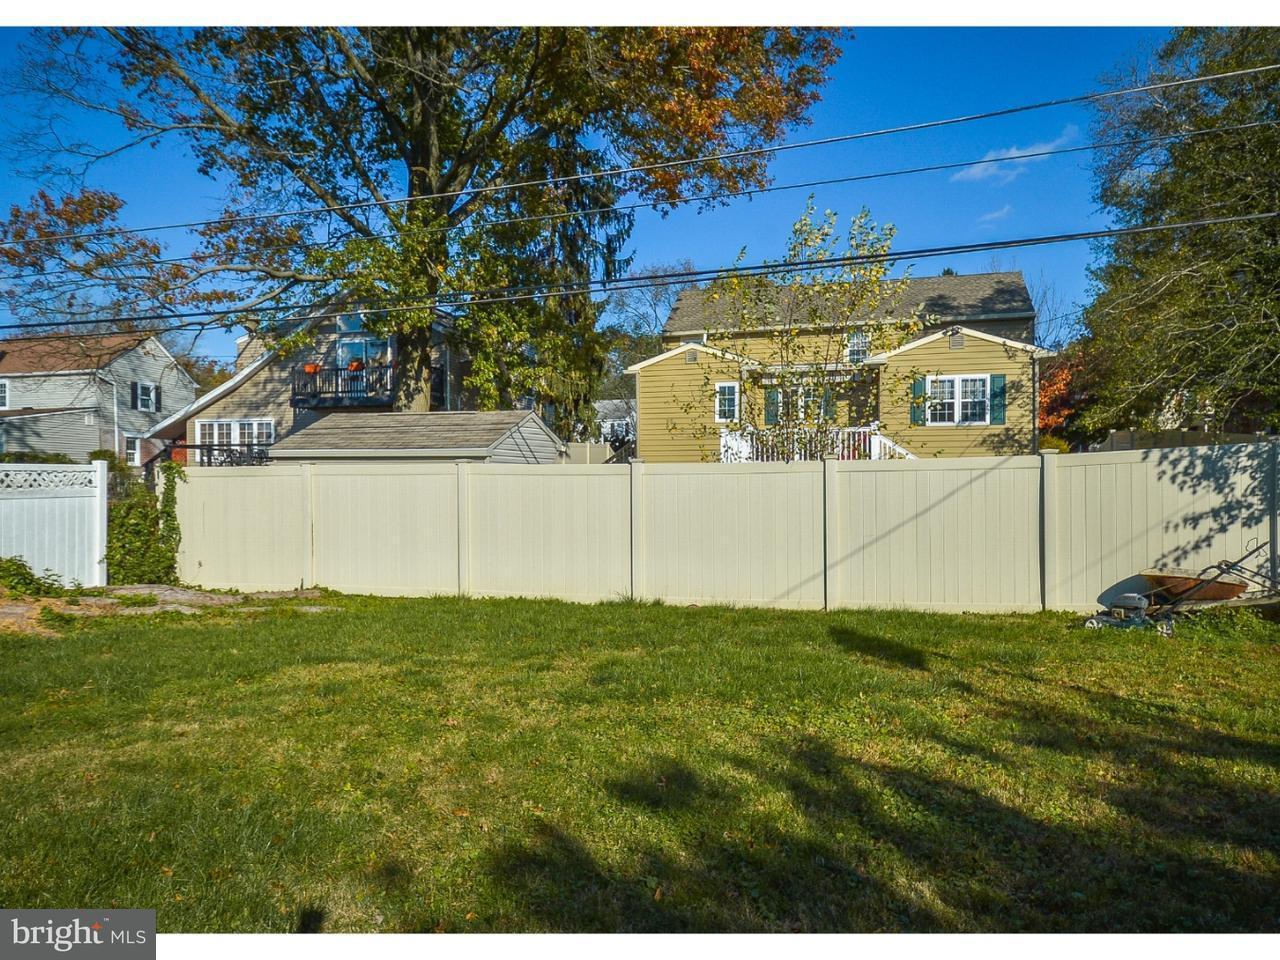 Single Family Home for Sale at 518 ORELAND MILL Road Oreland, Pennsylvania 19075 United States